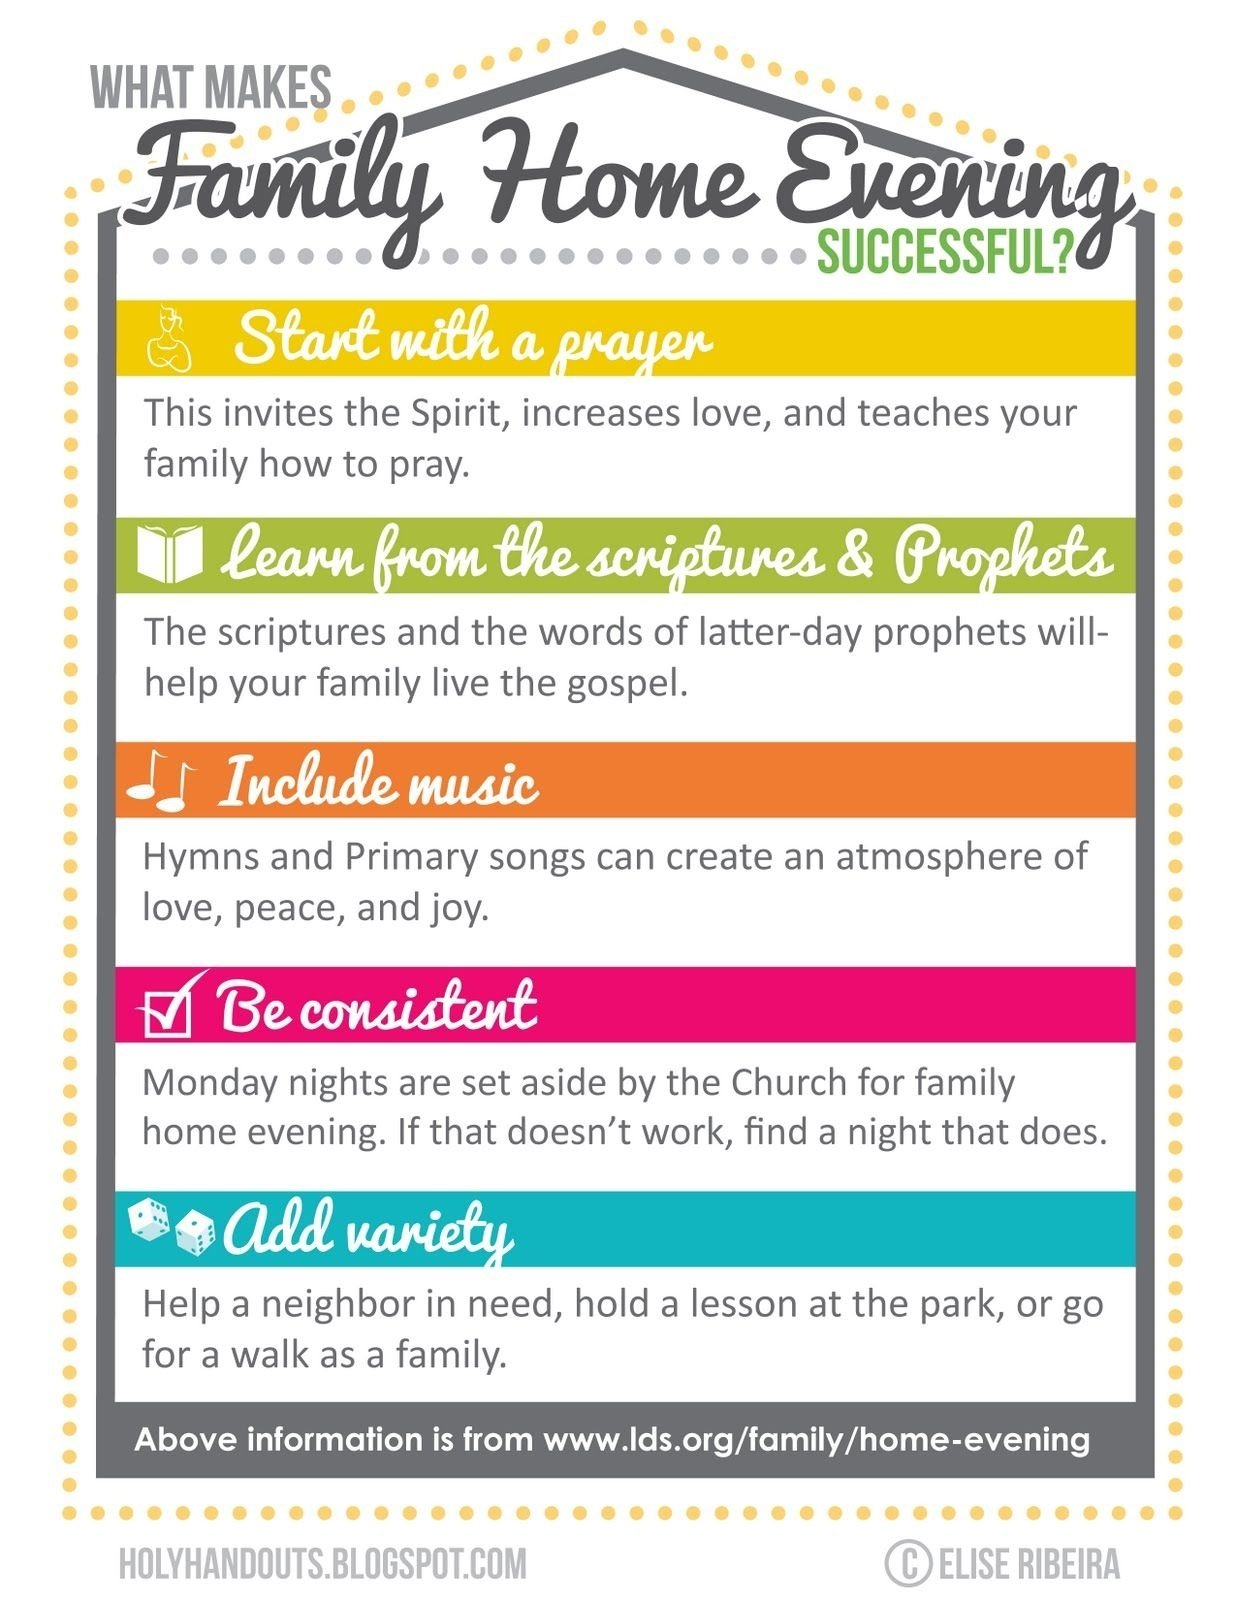 10 Fabulous Lds Family Home Evening Ideas i like this idea of a family home evening gets the family praying 2020